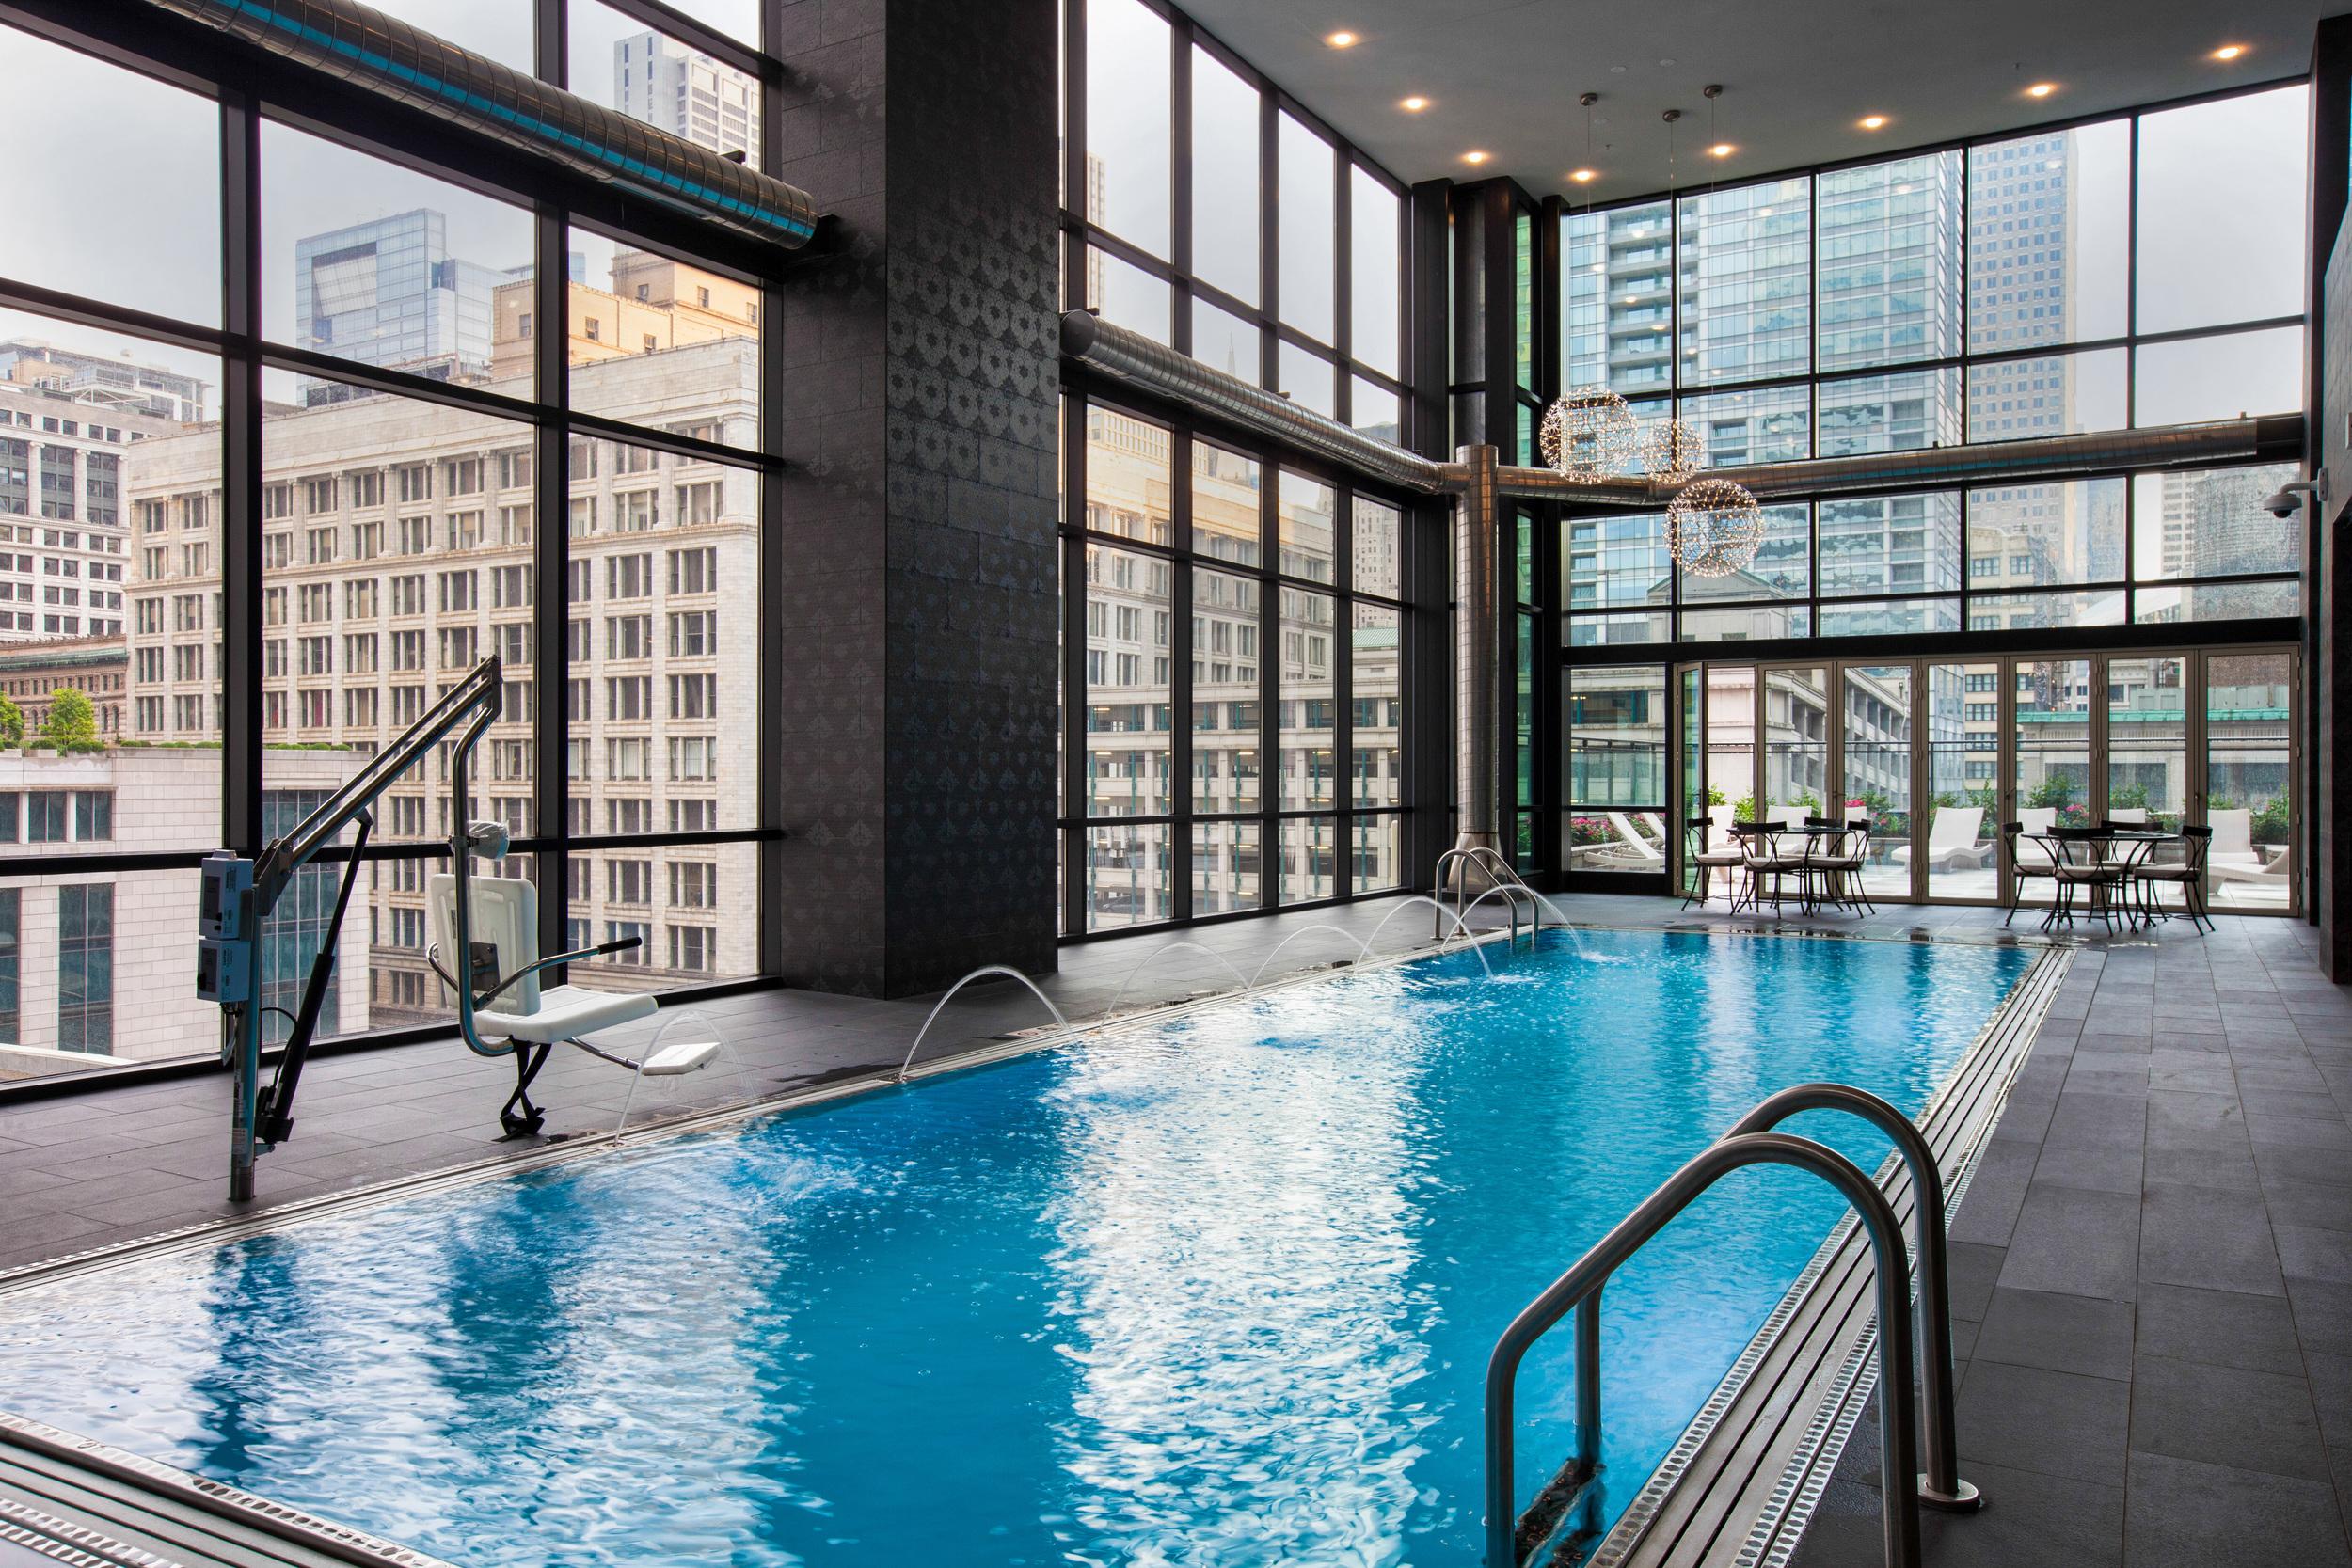 indoor_pool_photography_chicago.jpg